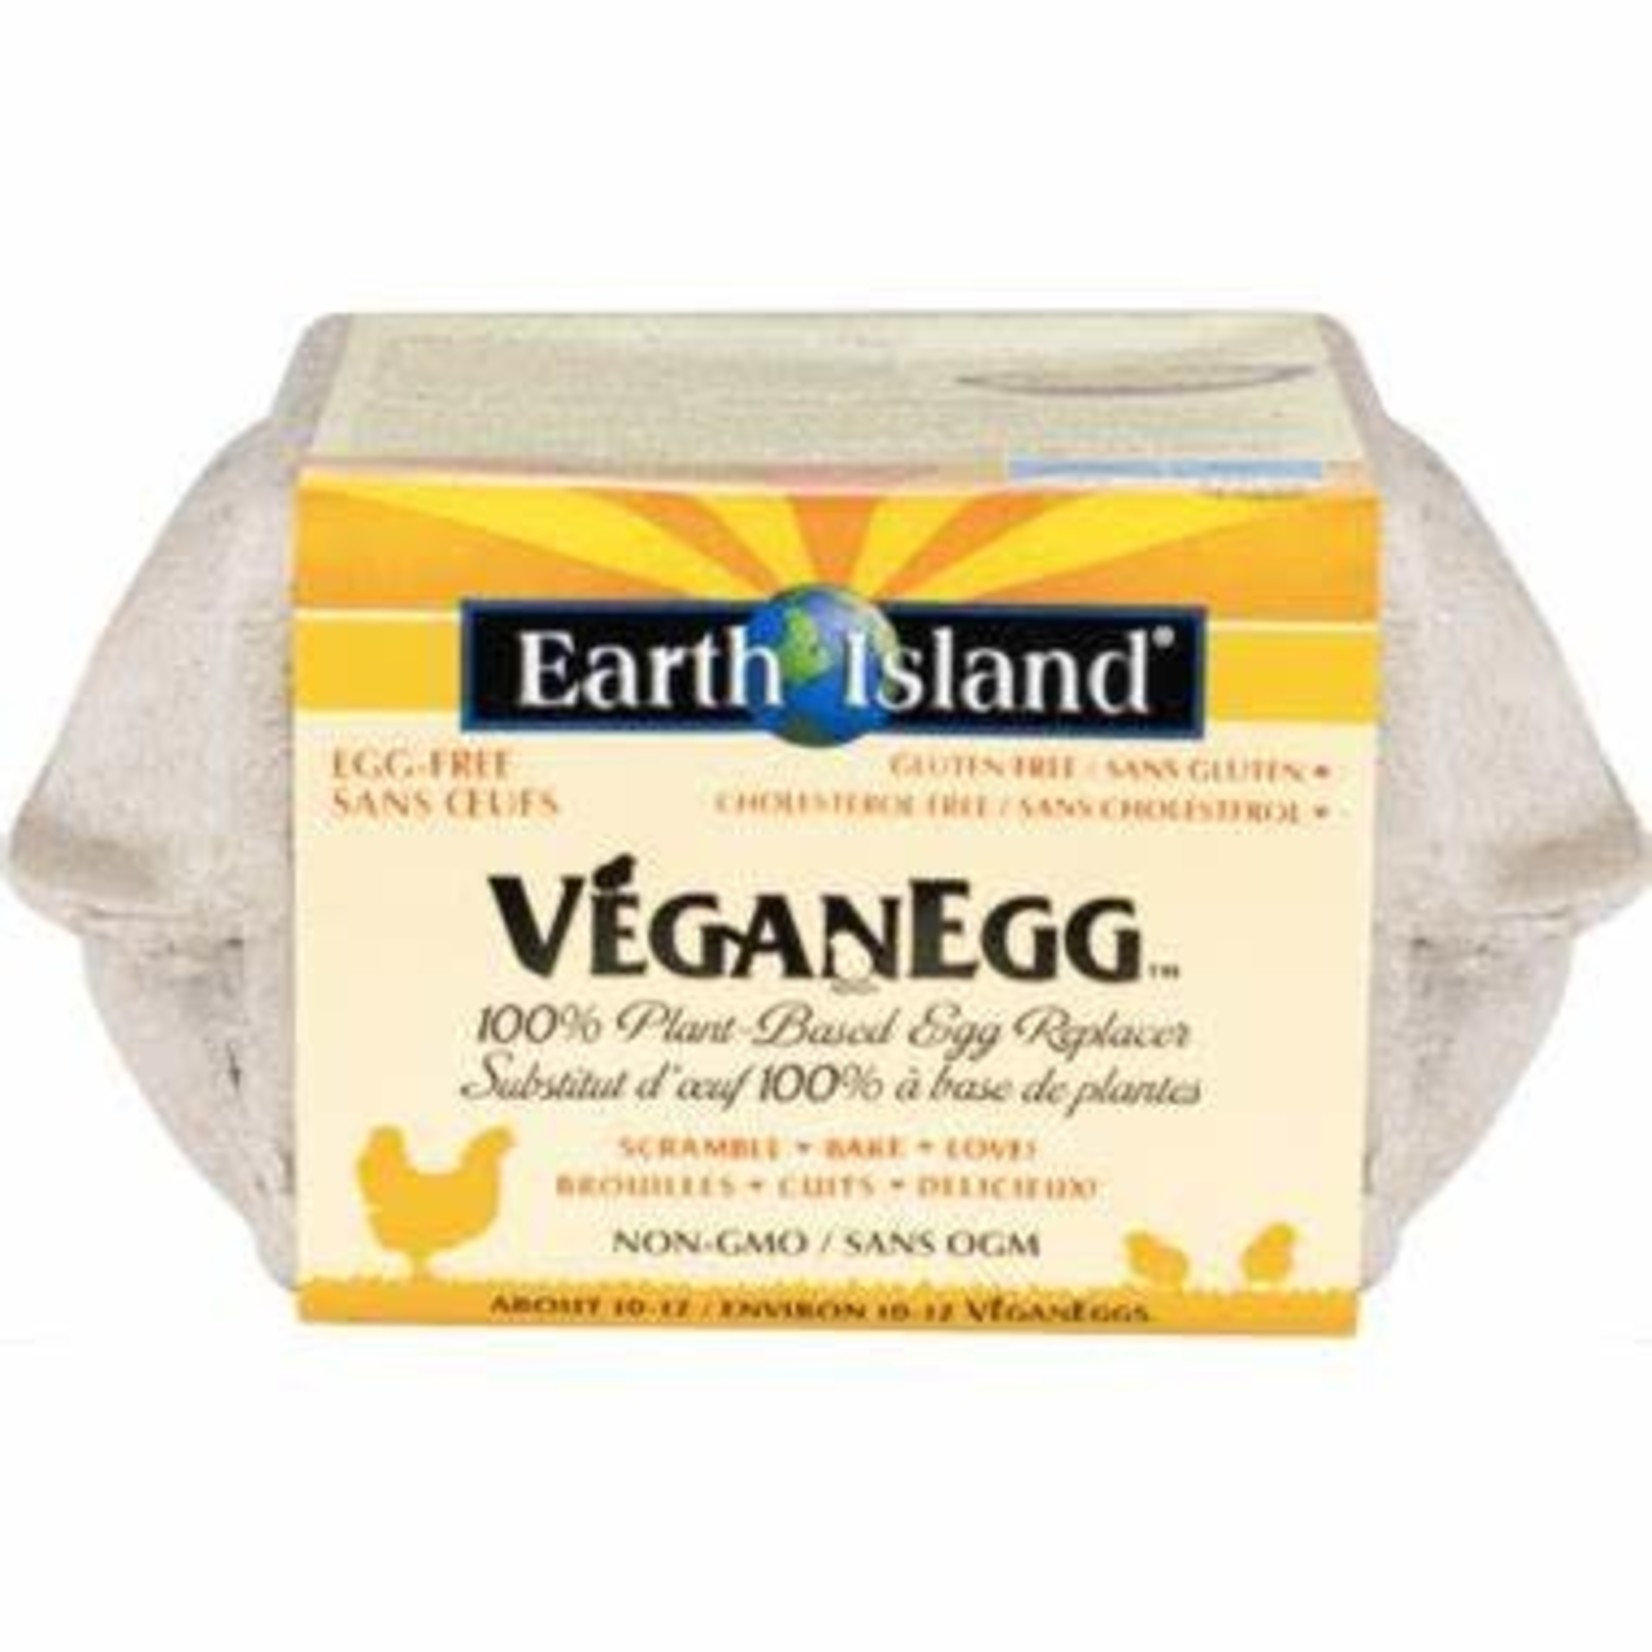 Earth Island Earth Island VeganEgg